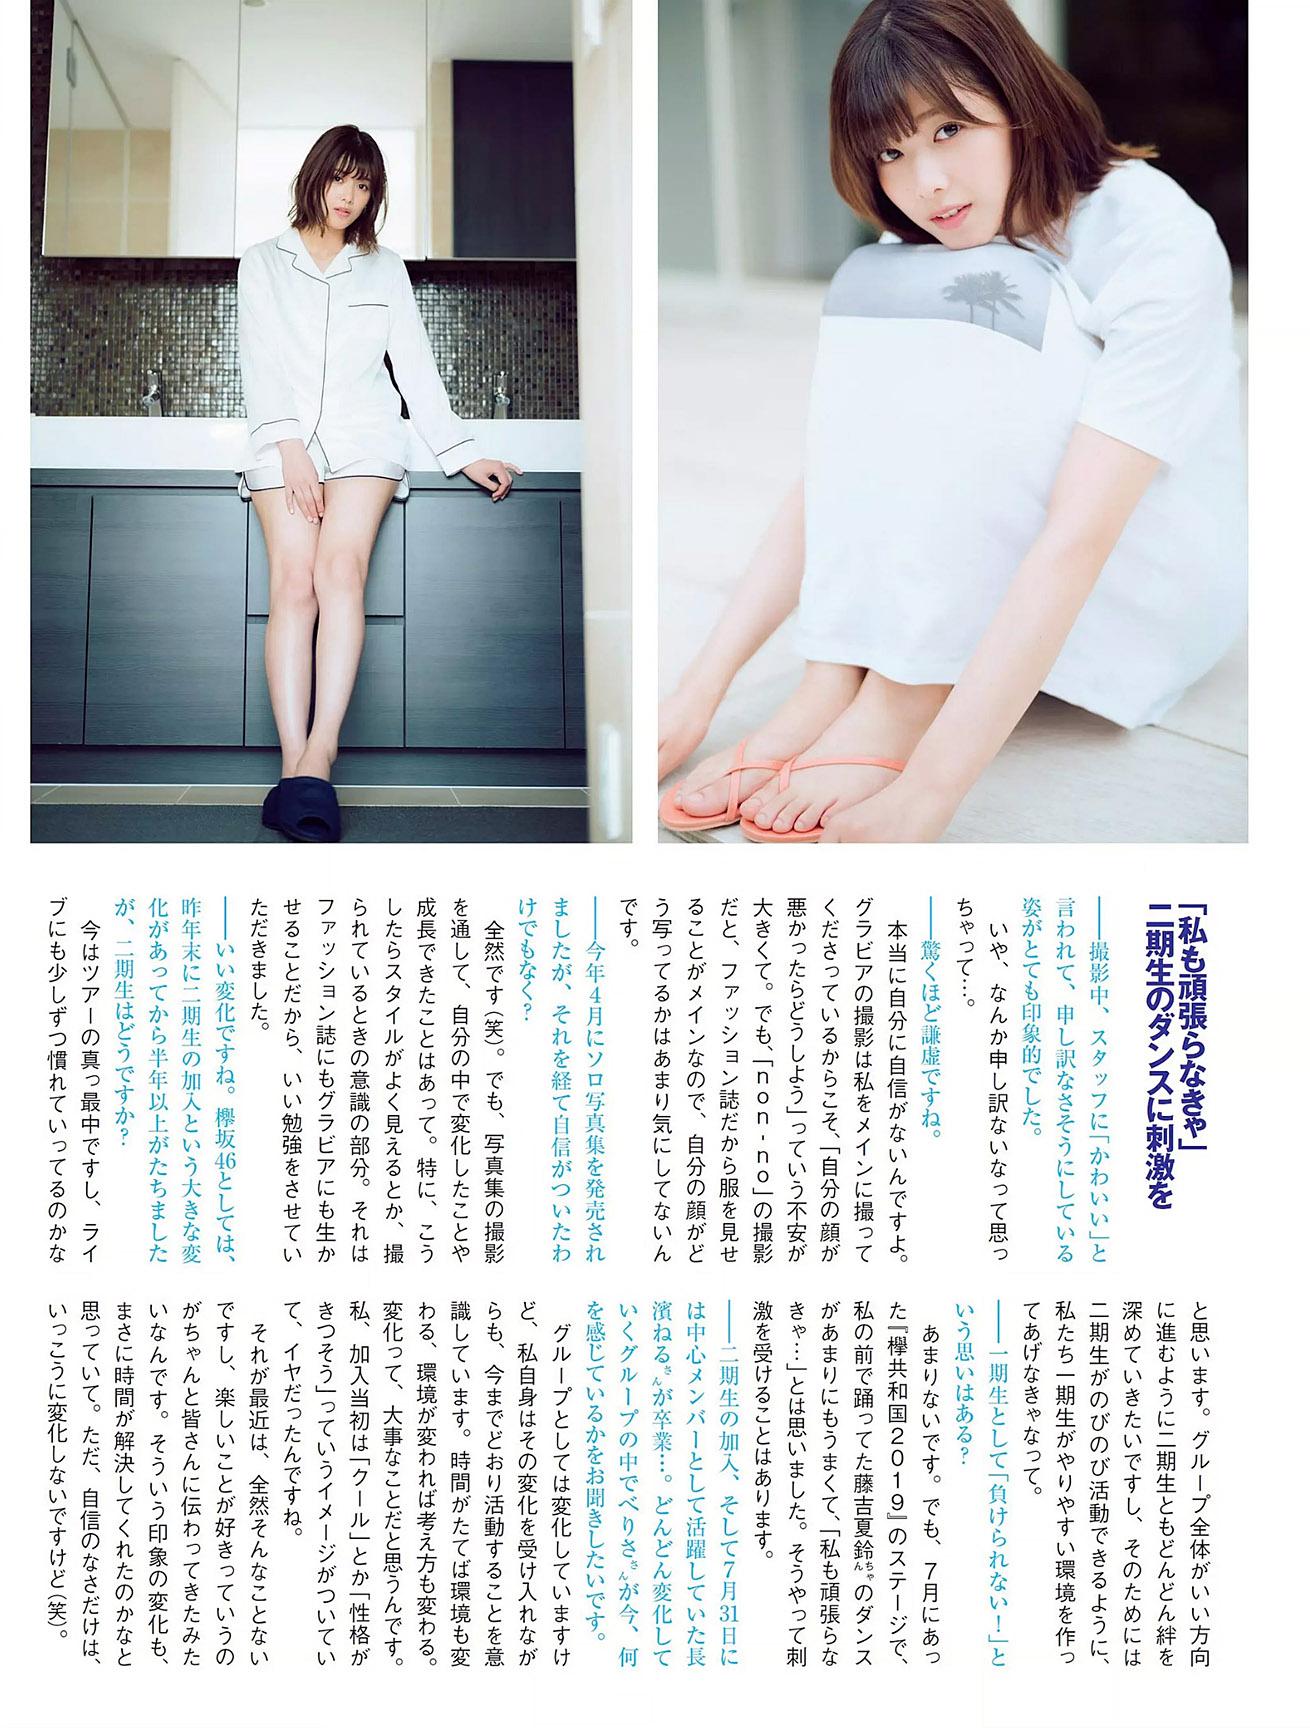 Risa Watanabe Flash 190910 05.jpg